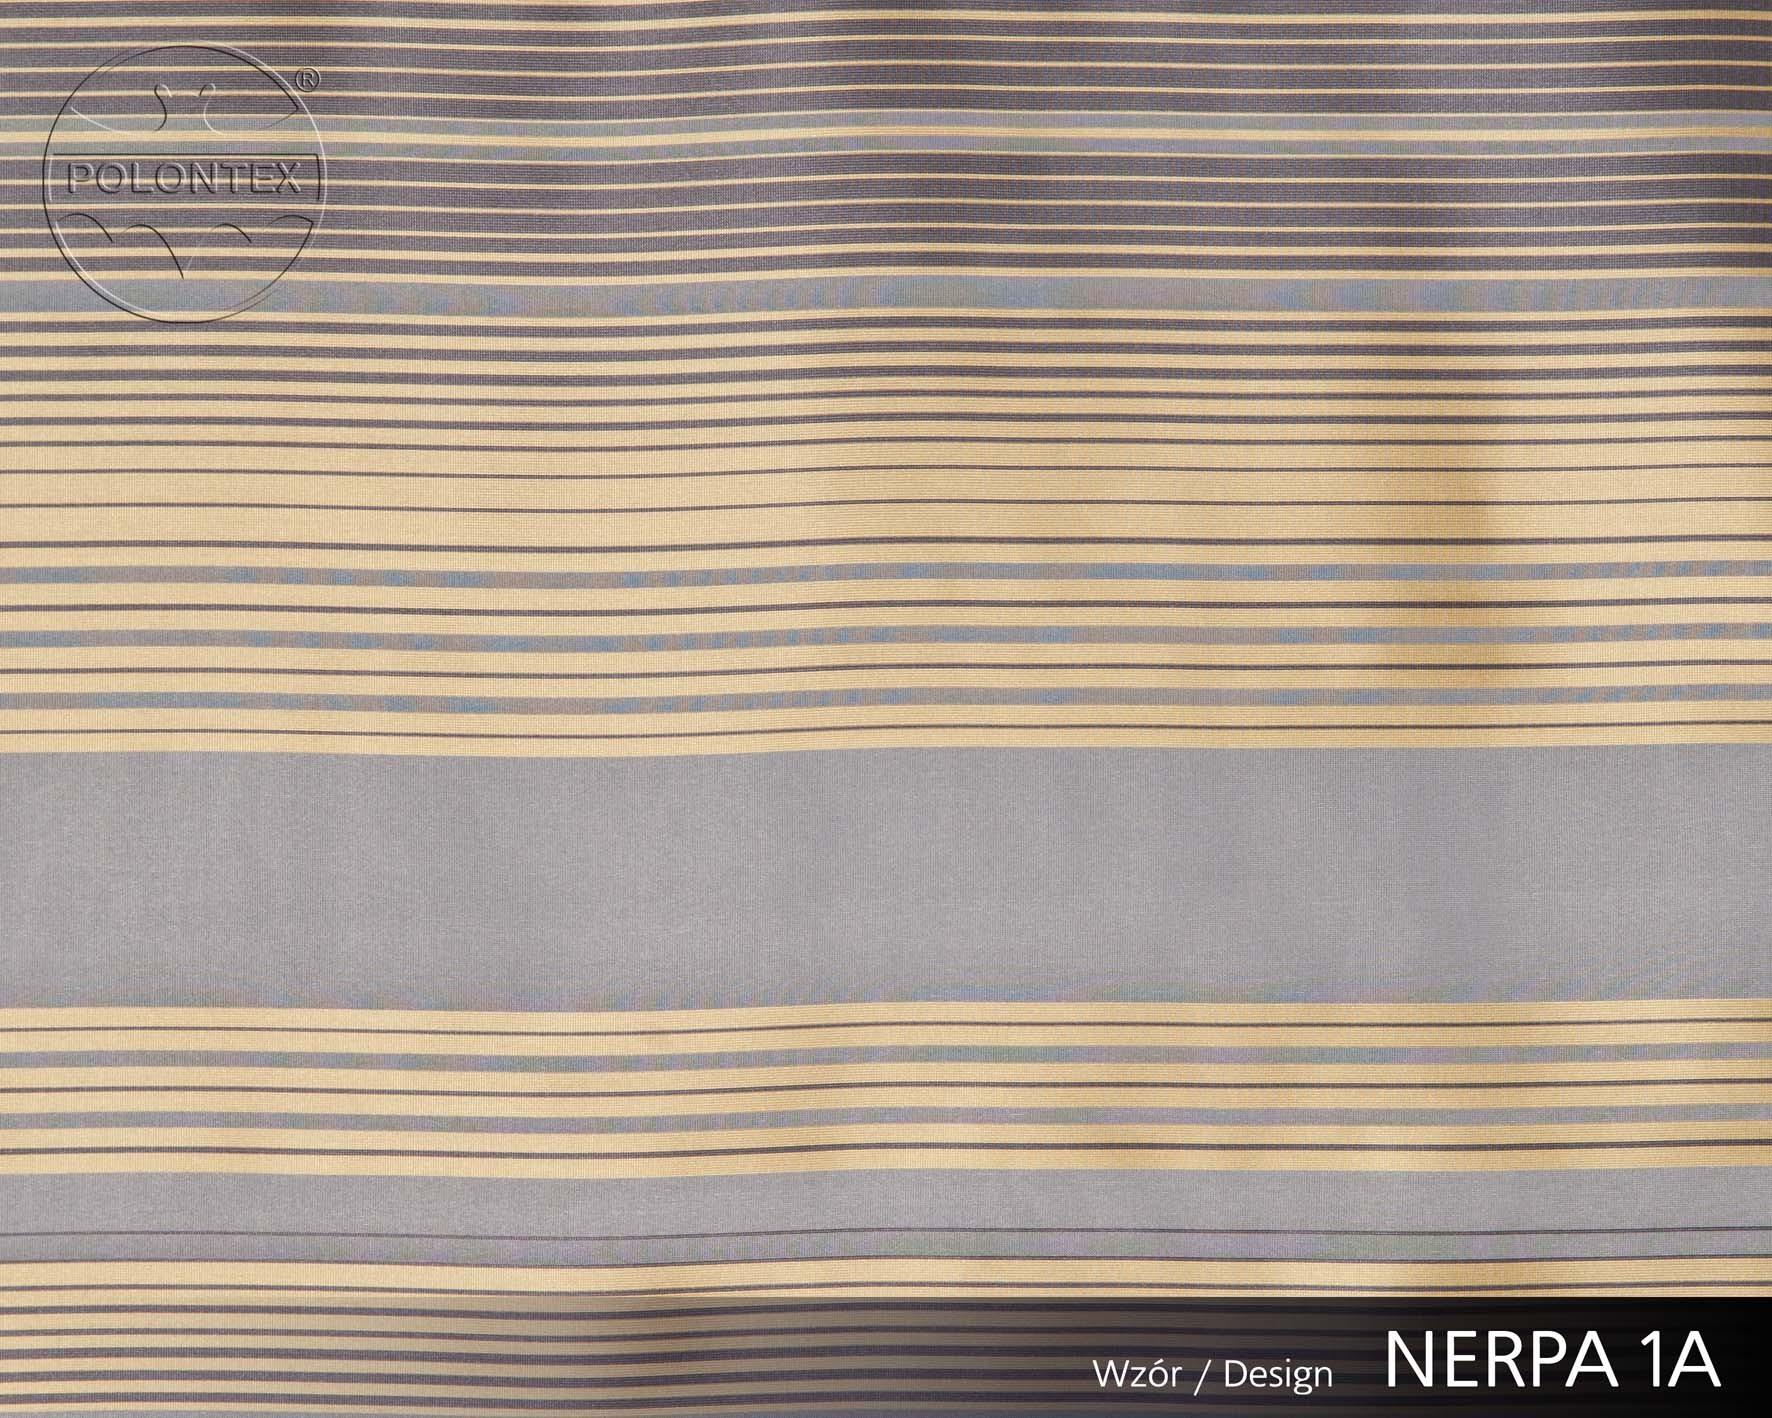 NERPA A243